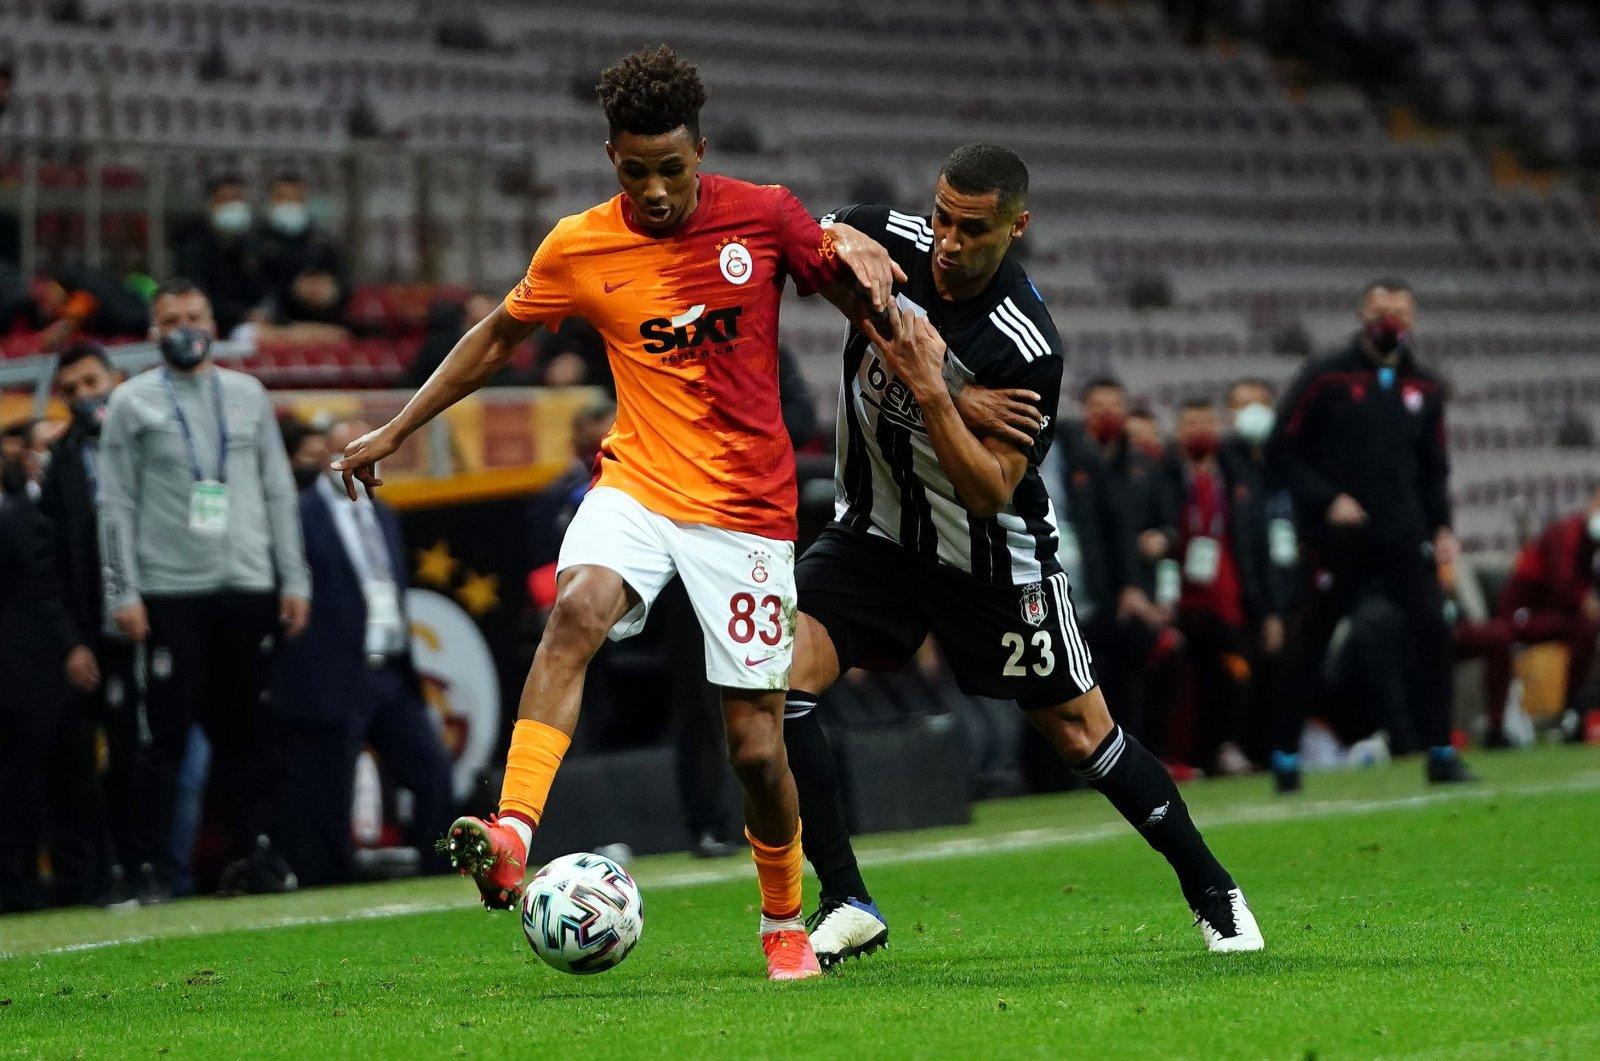 Galatasaray'sGedson Fernandes (L) and Beşiktaş'sWelinton vie for the ball during a Süper Lig match, Istanbul, Turkey, May 8, 2021. (IHA Photo)